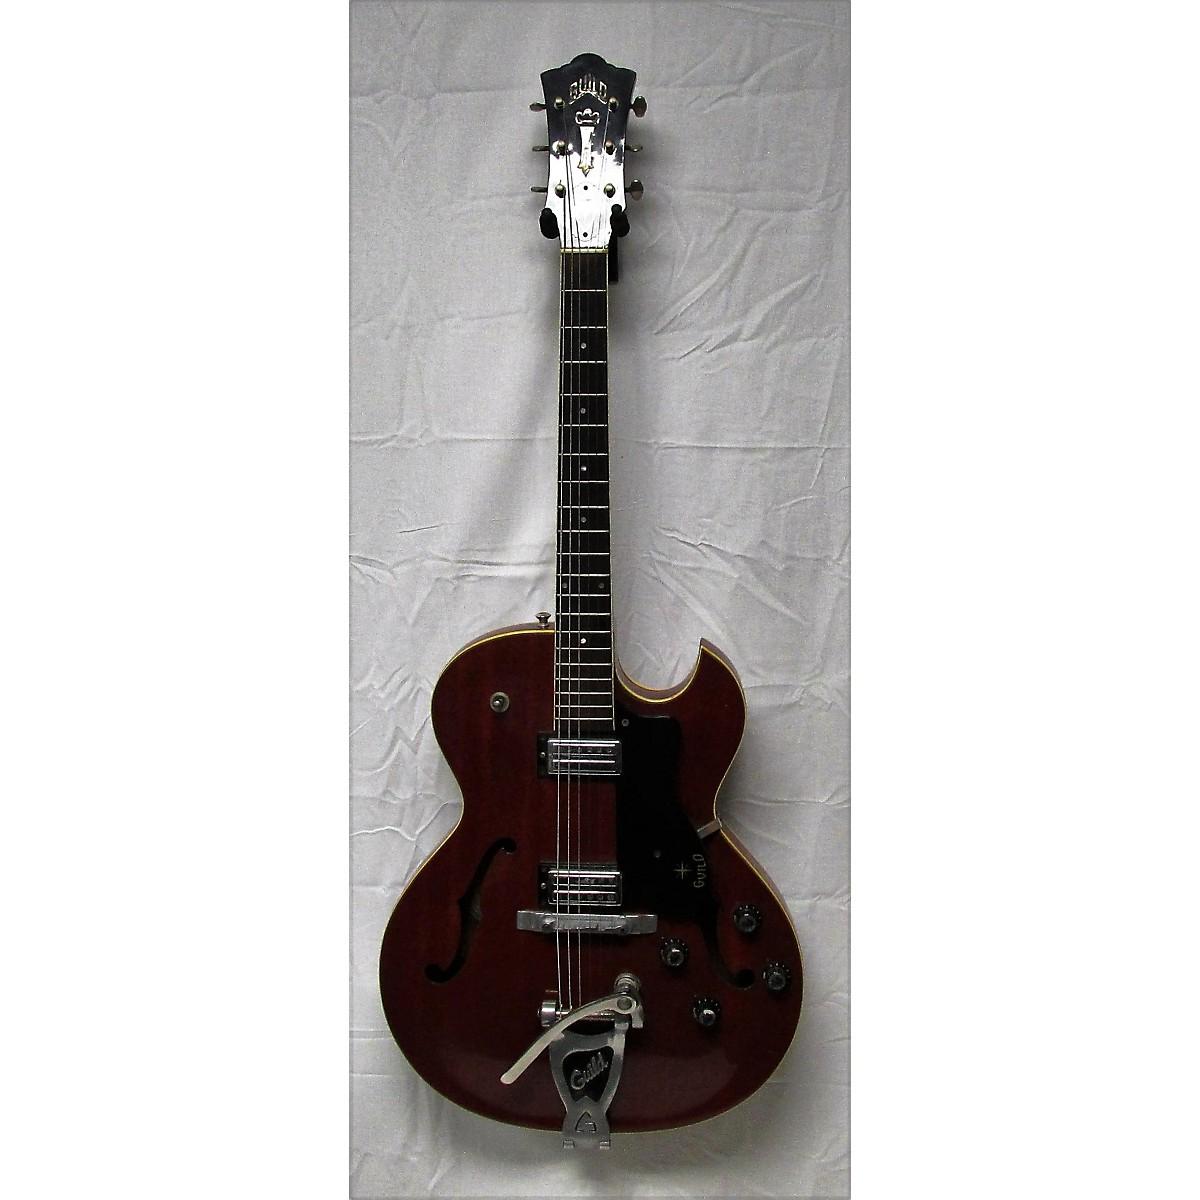 Guild 1964 Starfire III Hollow Body Electric Guitar